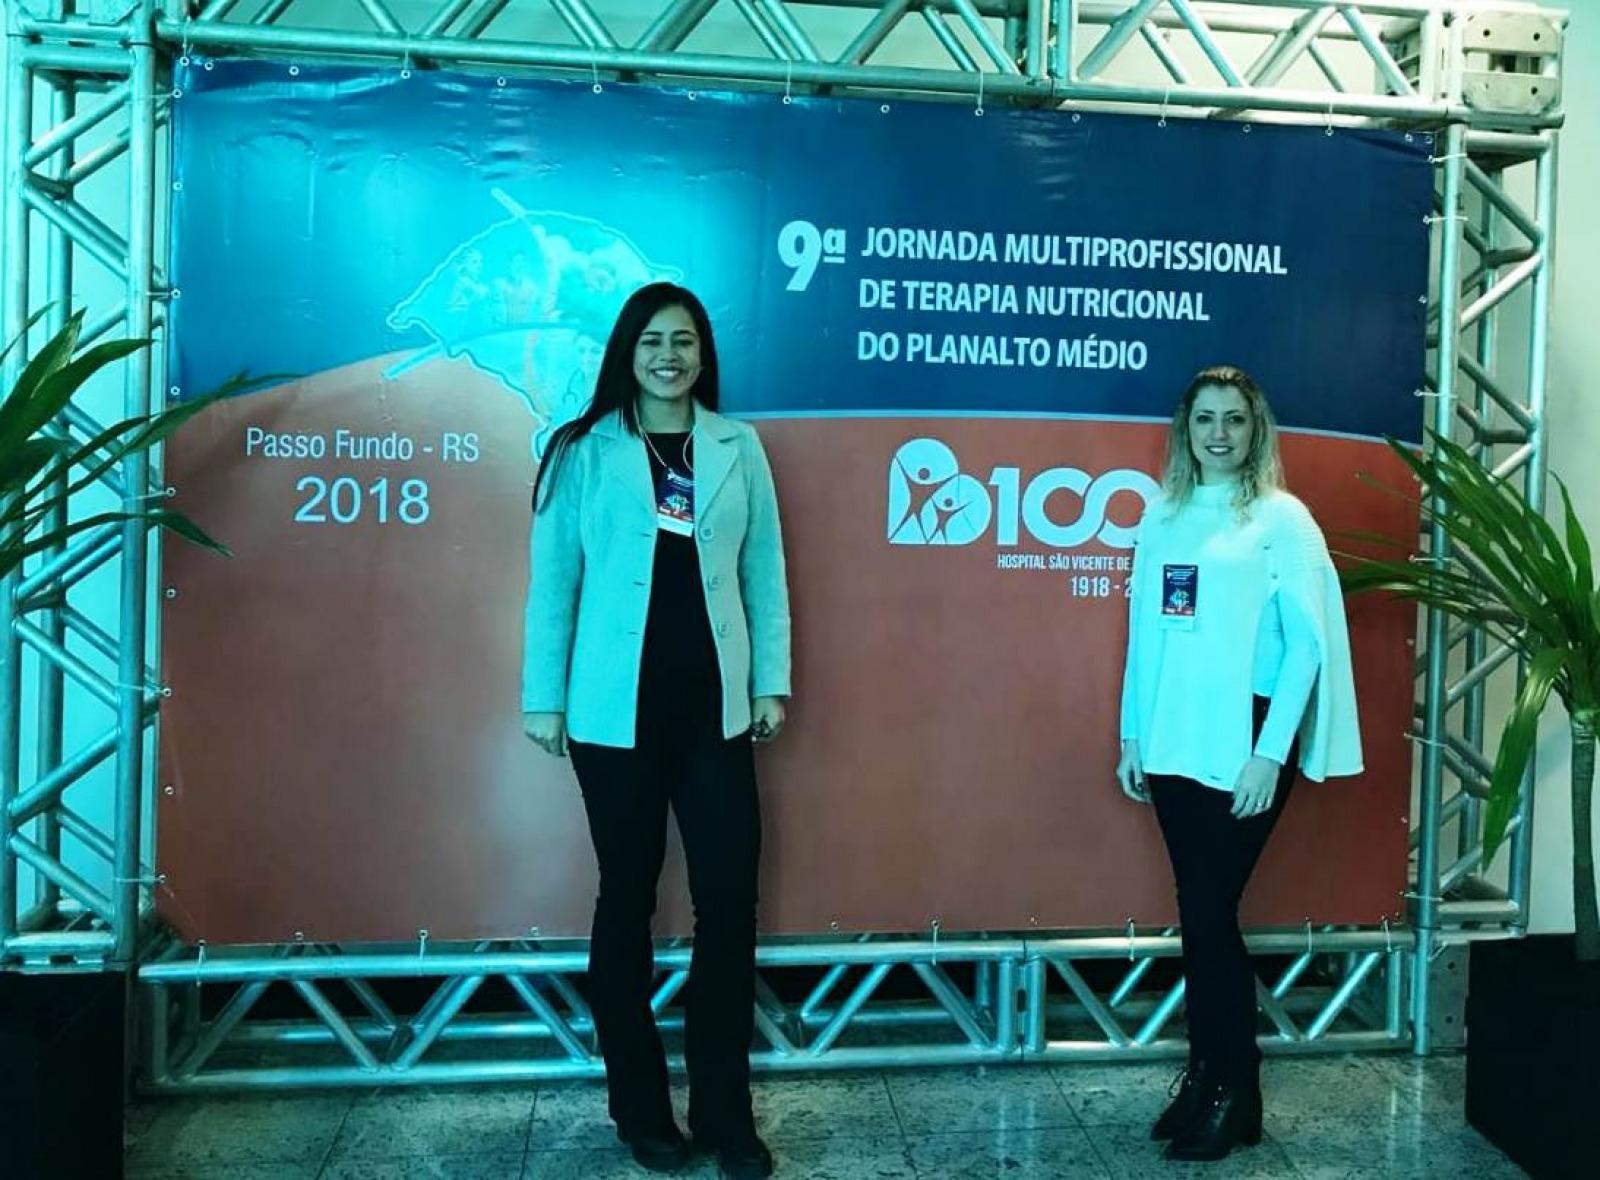 9ª Jornada Multiprofissional de Terapia Nutricional do Planalto Médio